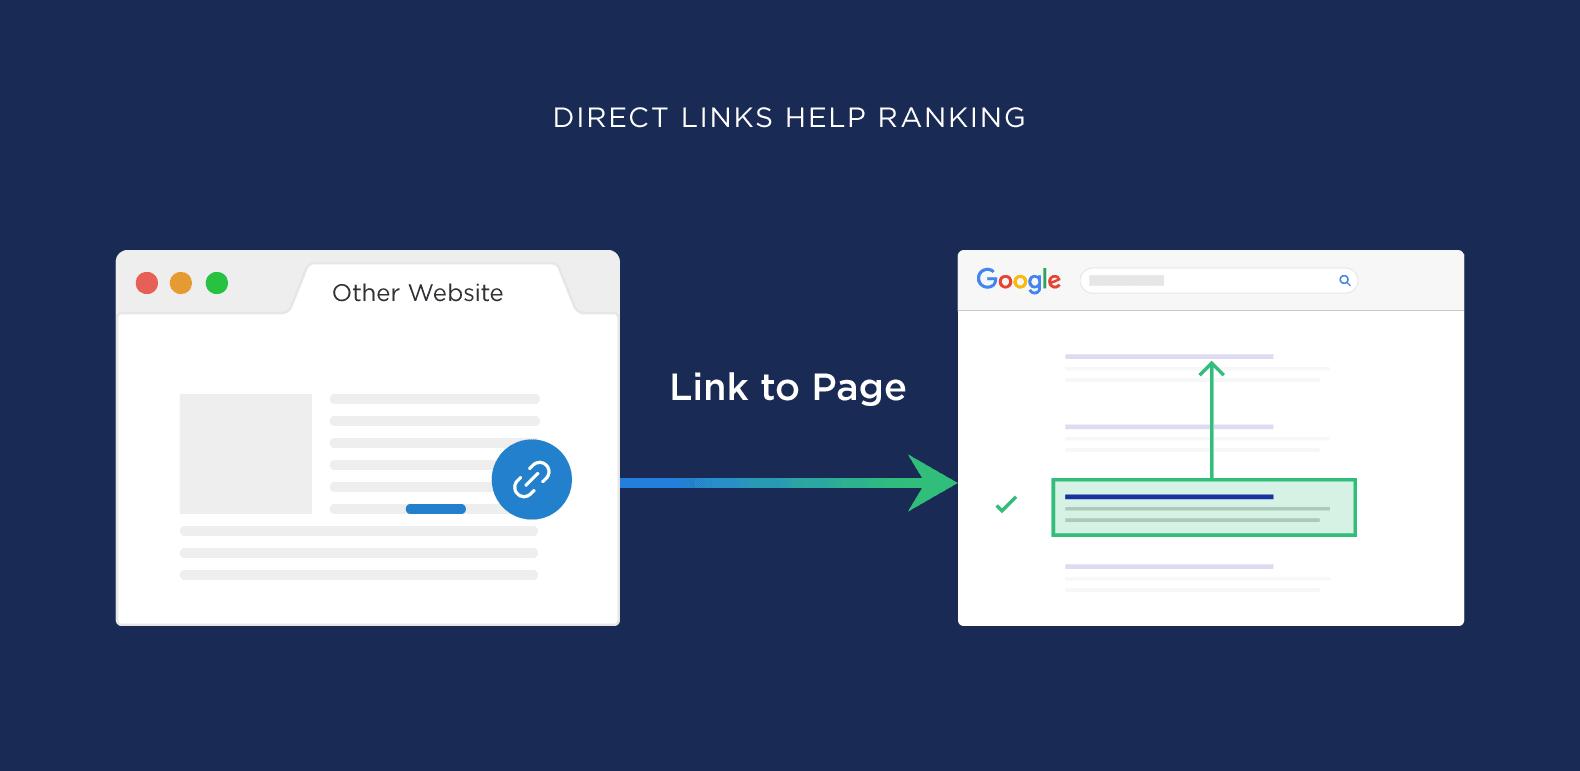 Direct links help rankings